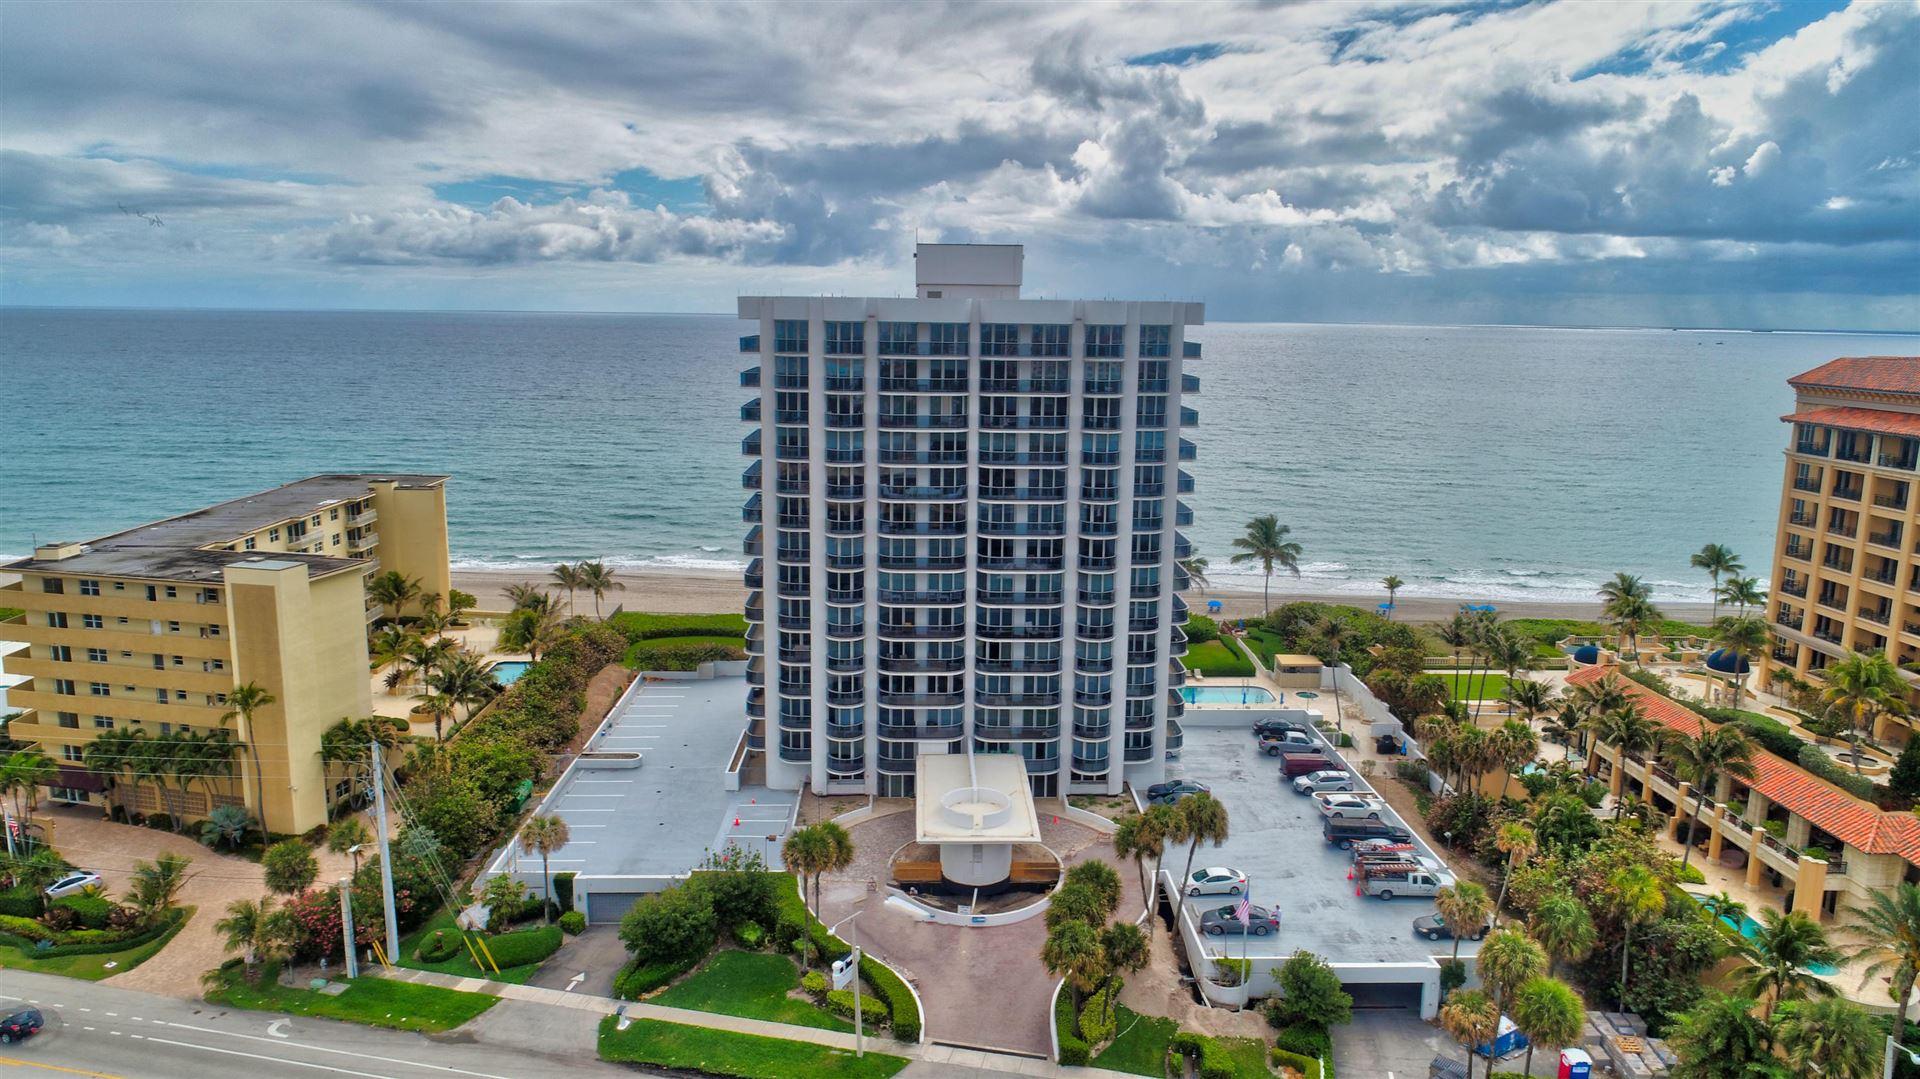 350 S Ocean Boulevard #5-A, Boca Raton, FL 33432 - #: RX-10611910